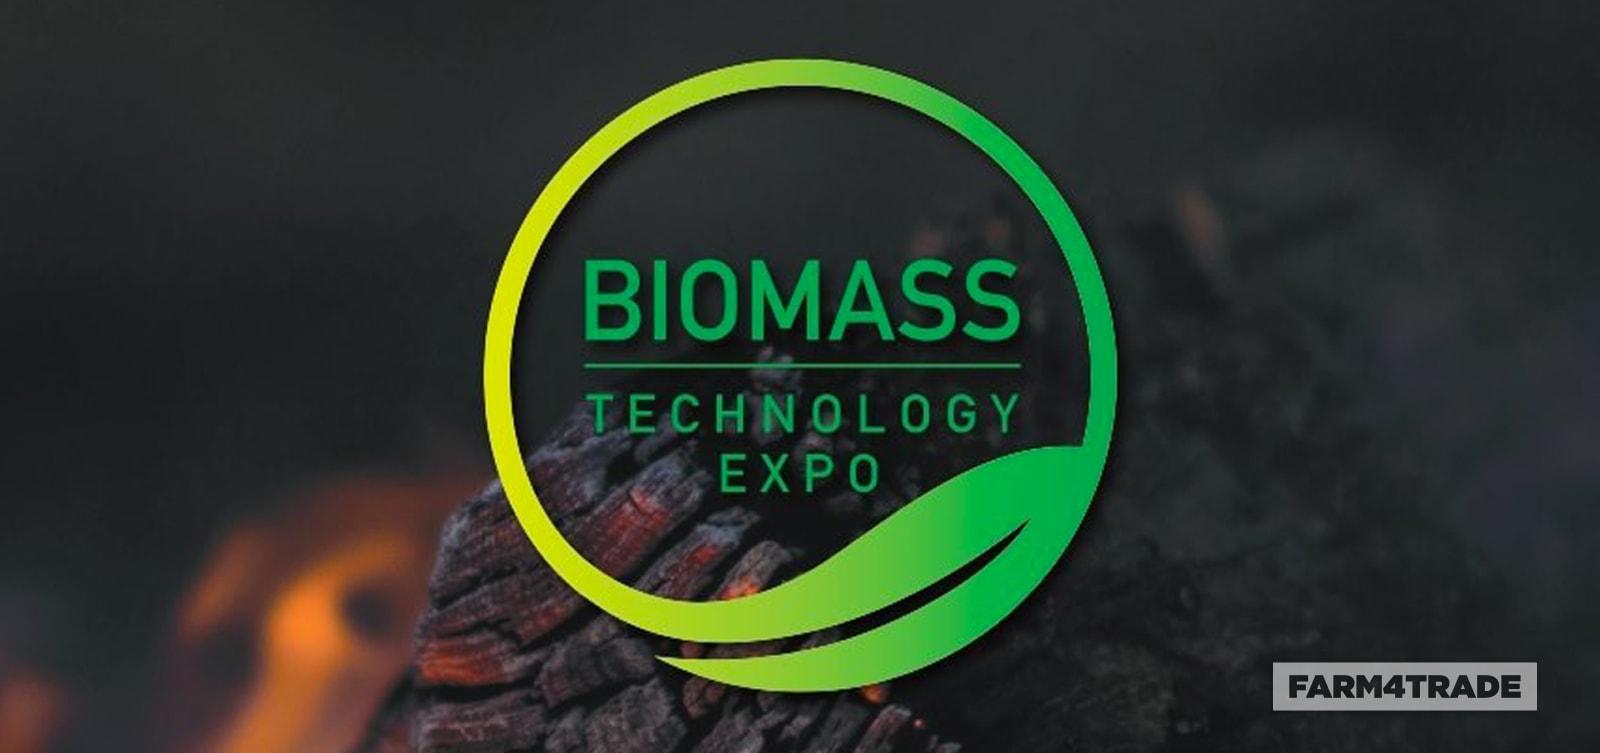 Farm4Trade - Biomass Technology Expo 2019 Namibia